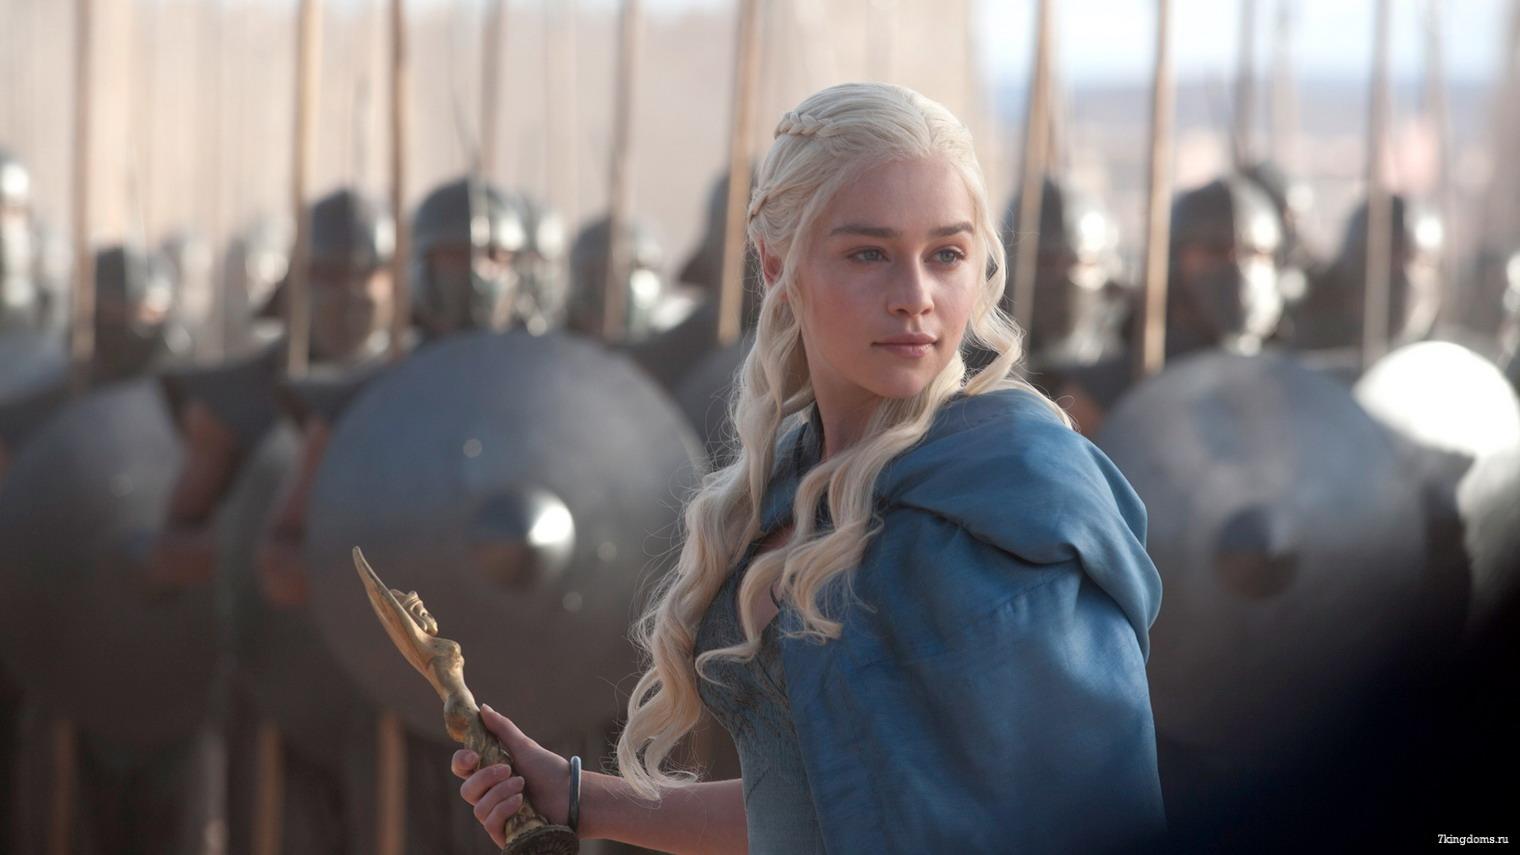 daenerys targarien madre de dragones vestido azul , ejercito atras